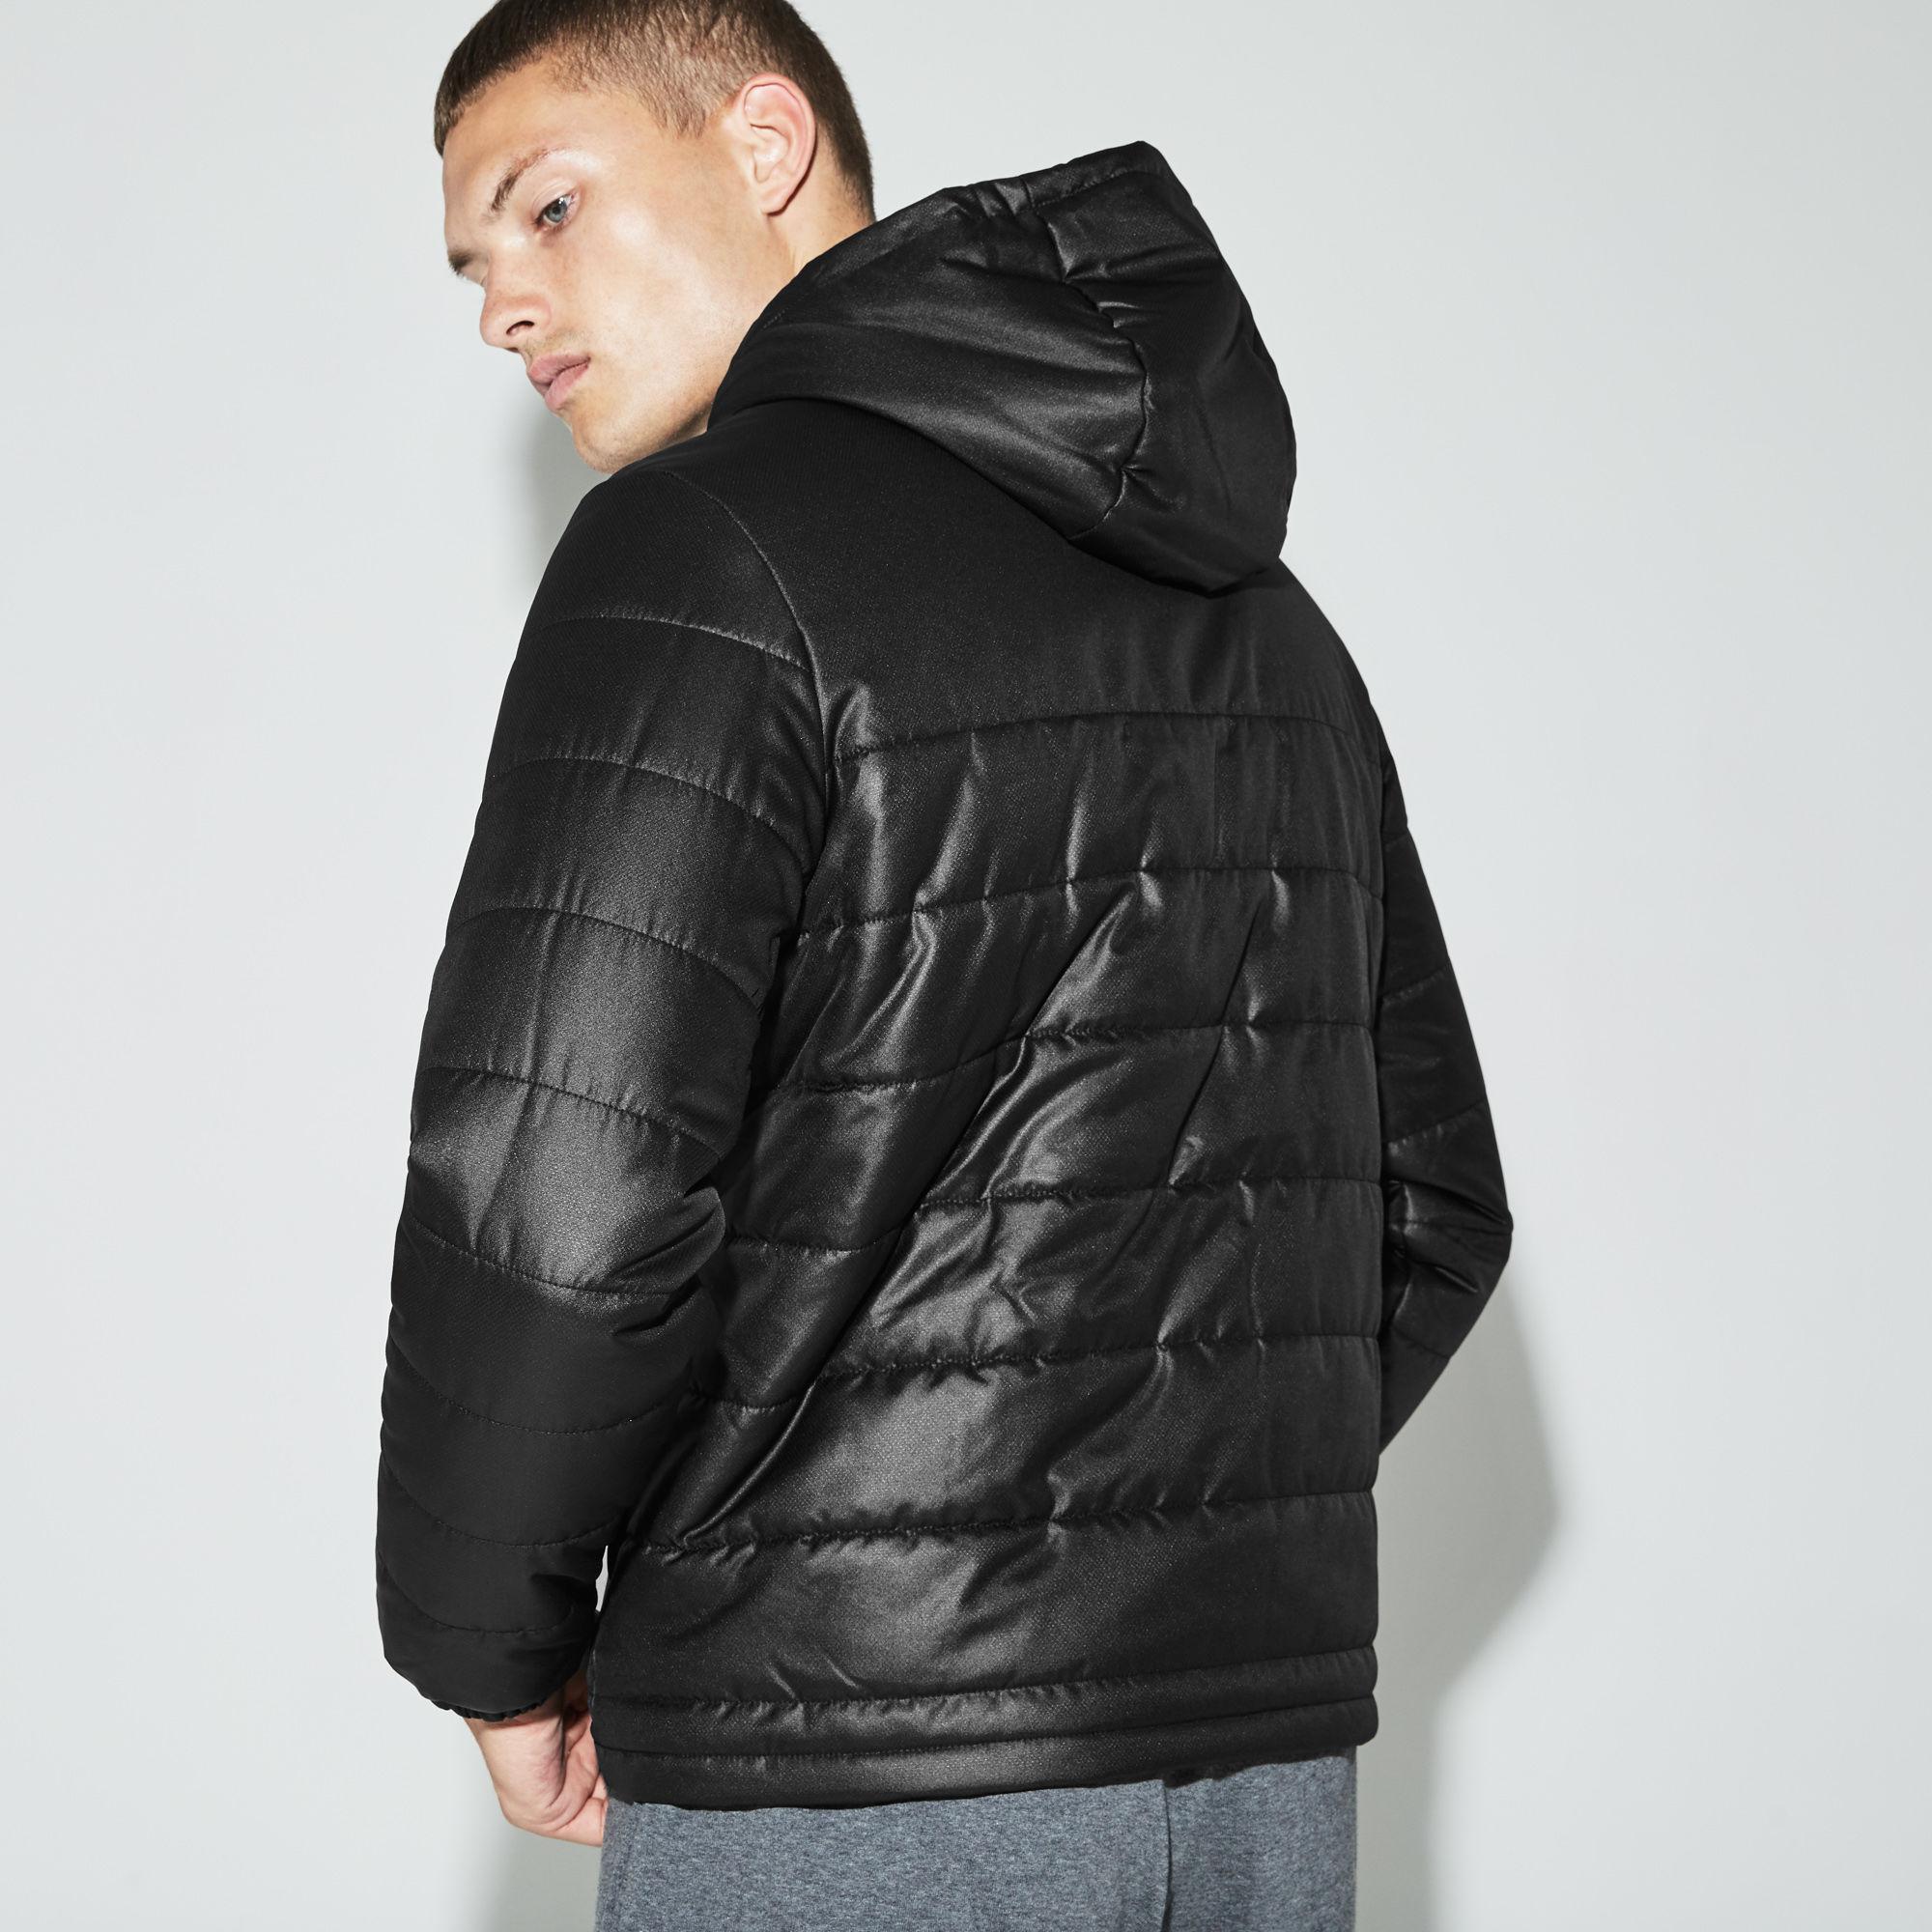 2d072d0ad8 Lacoste Sport Hooded Water-resistant Taffeta Tennis Jacket in Black ...